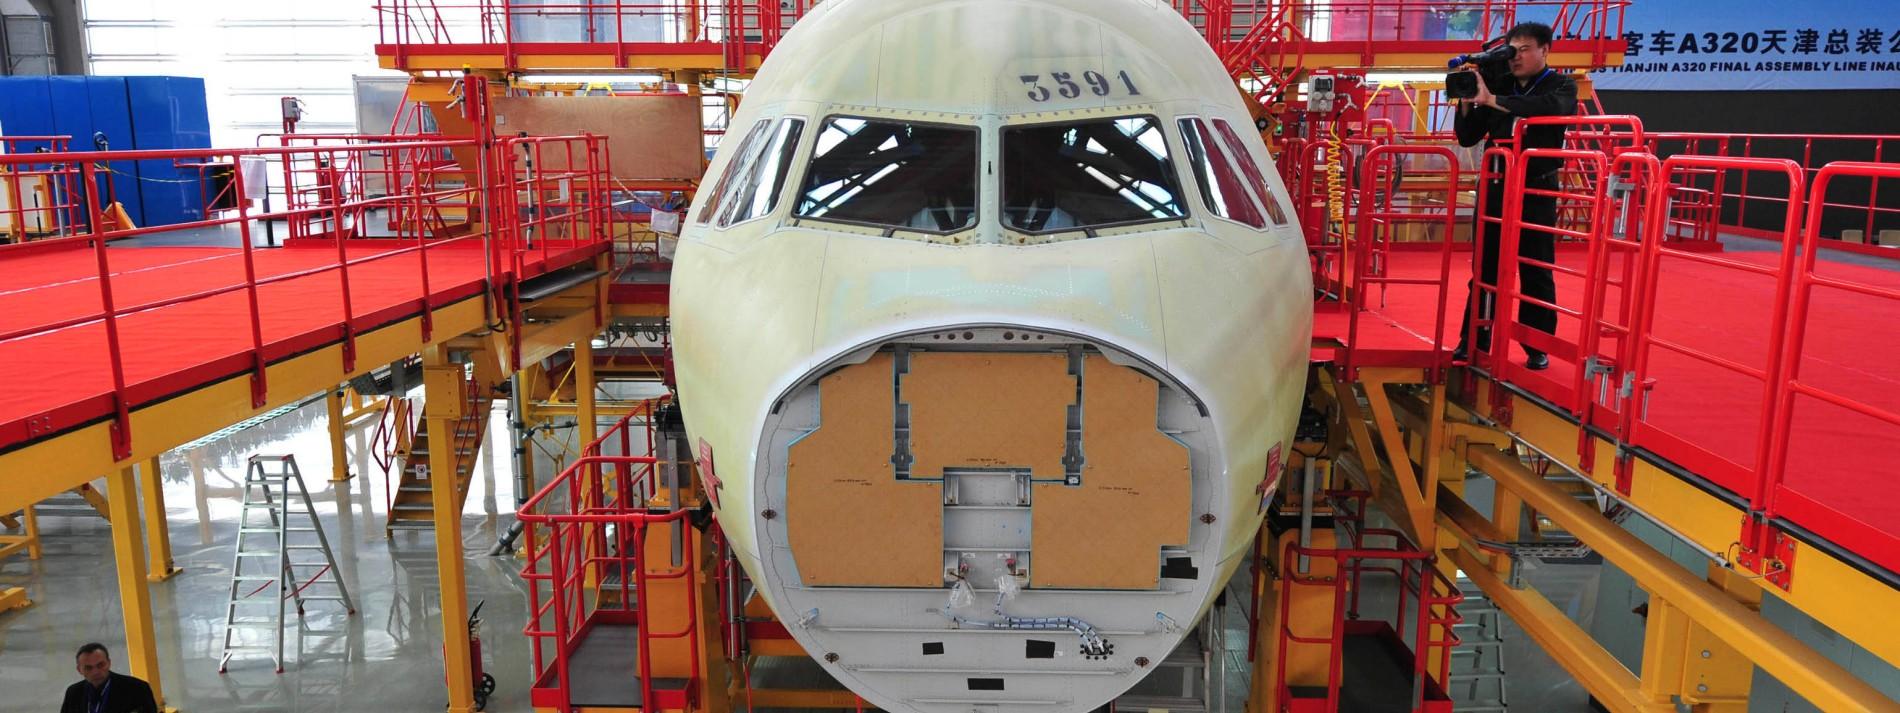 Airbus firma nuevo acuerdo con AVIC |